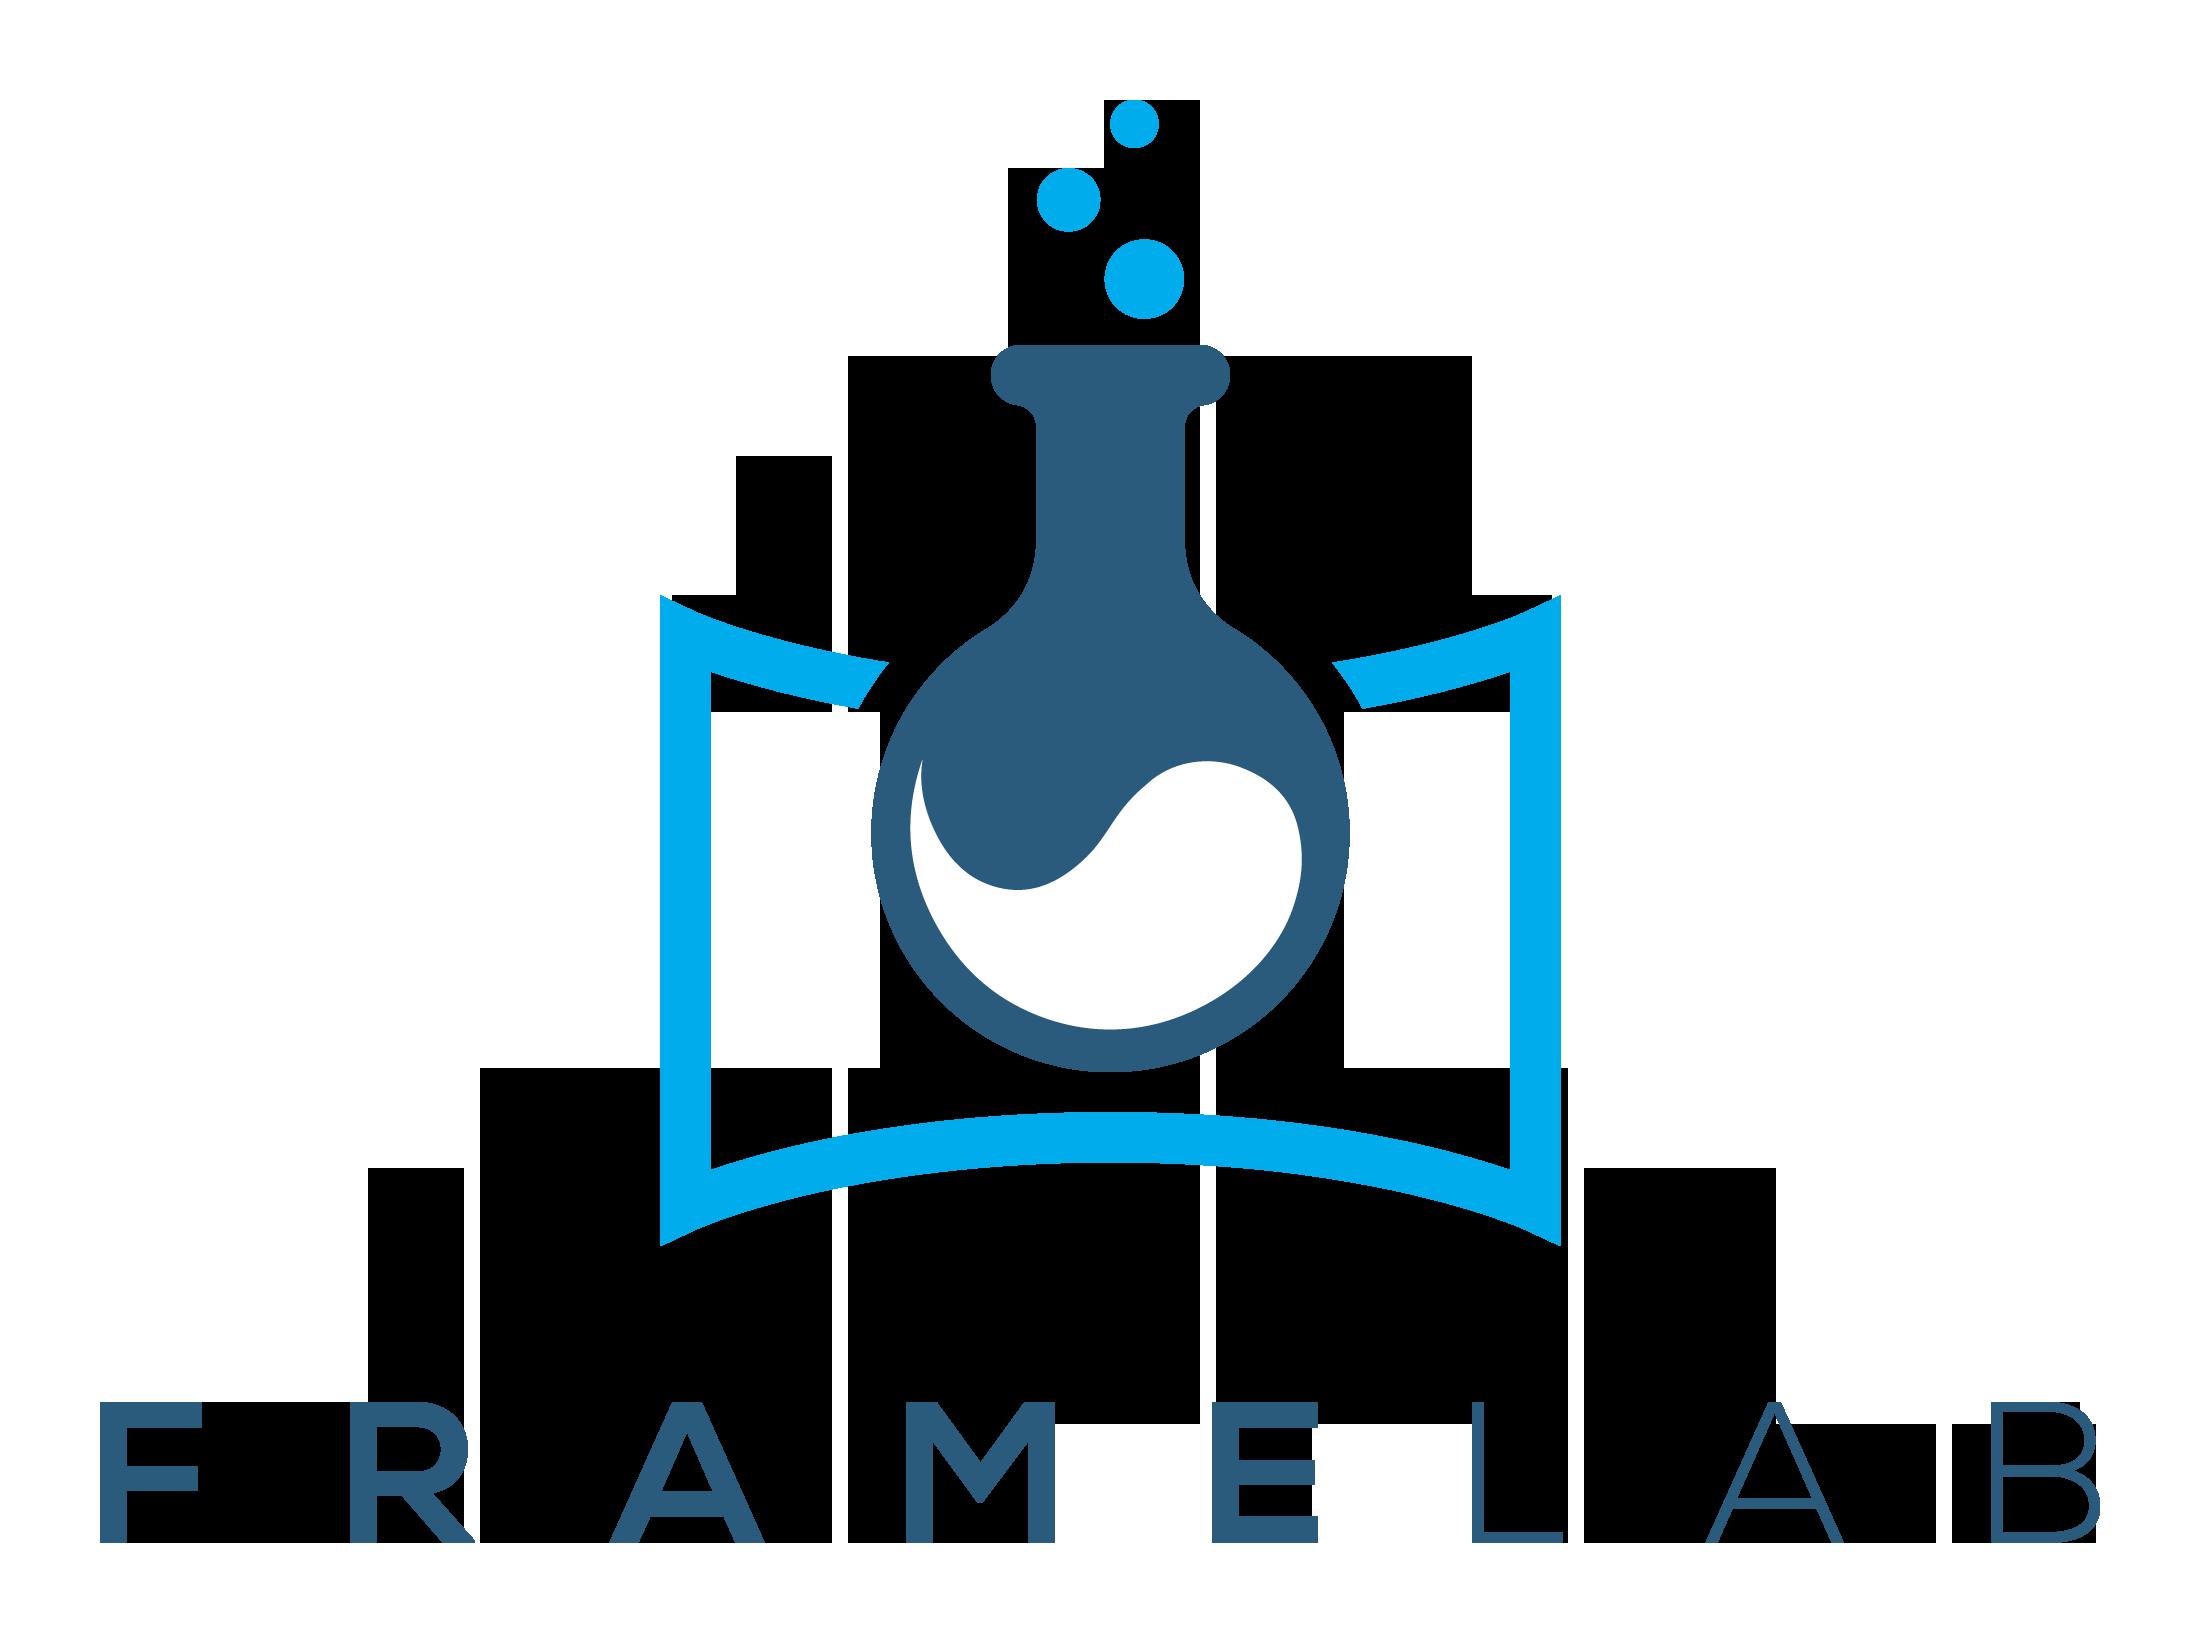 FRAMELAB | Video Production, Motion Graphics, Animation